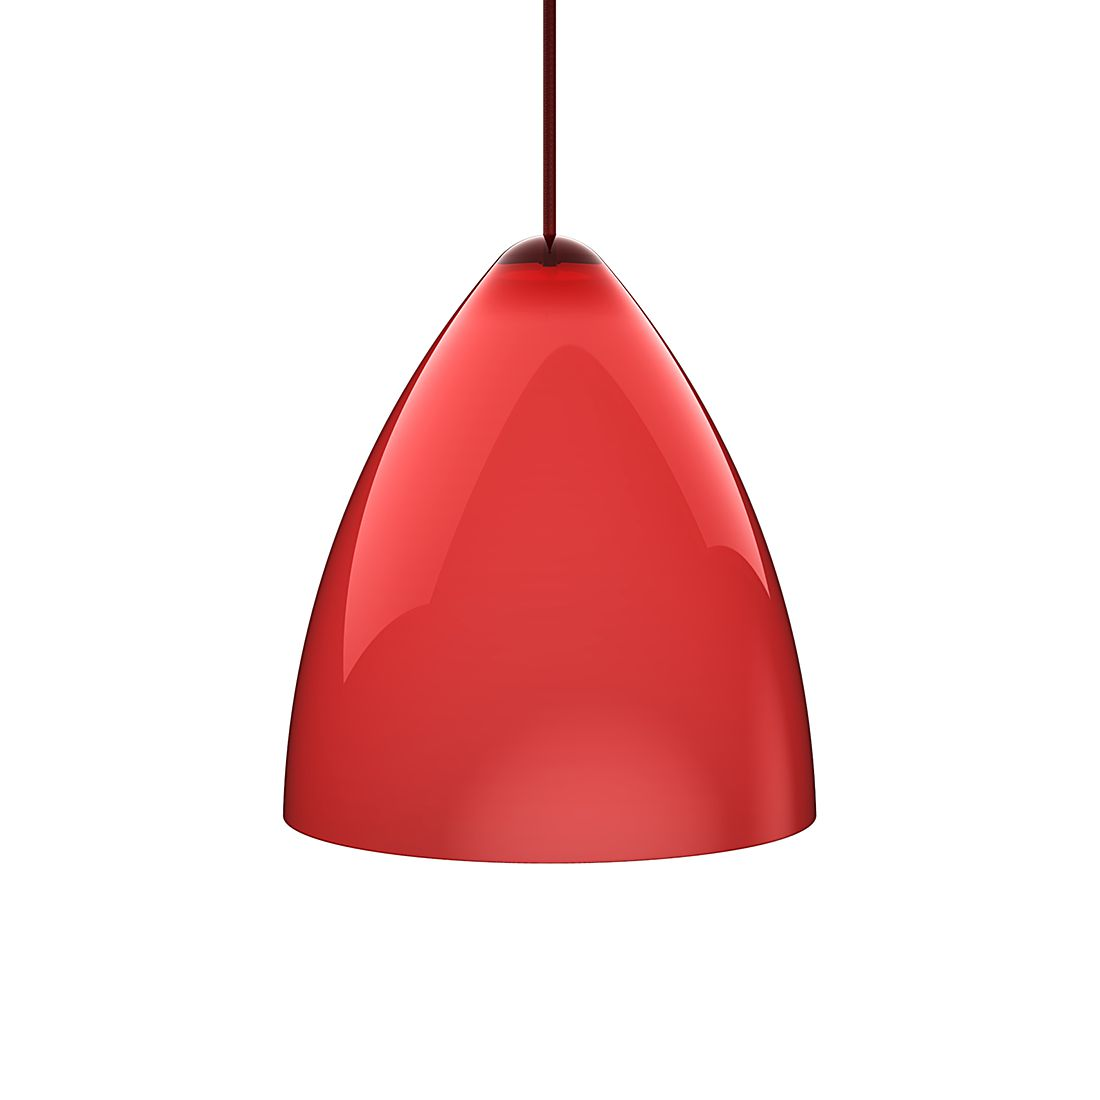 pendelleuchte funk acrylglas textil rot rot durchmesser 22 cm nordlux g nstig kaufen. Black Bedroom Furniture Sets. Home Design Ideas